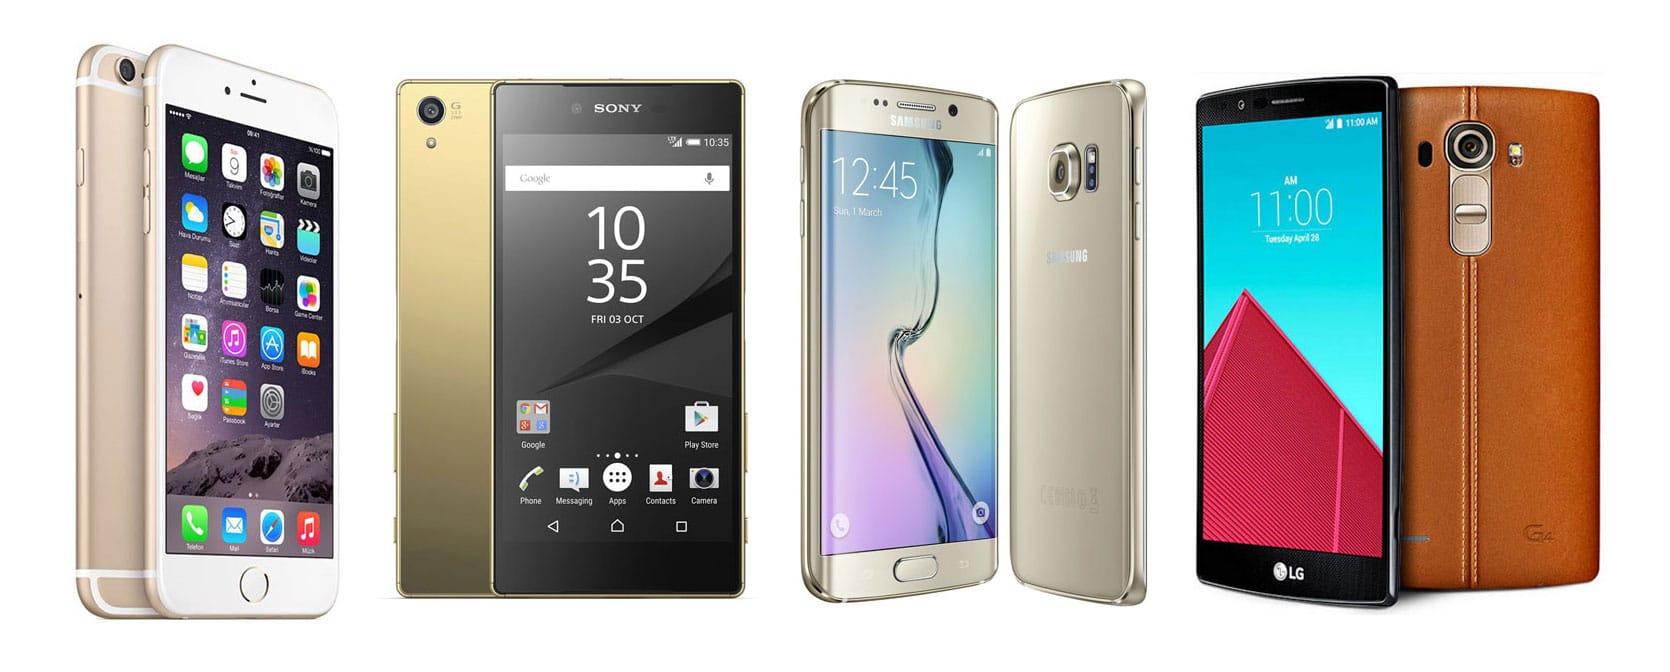 iphone 6s plus sony xperia Z5 premium galaxy s6 edge plus lg g4